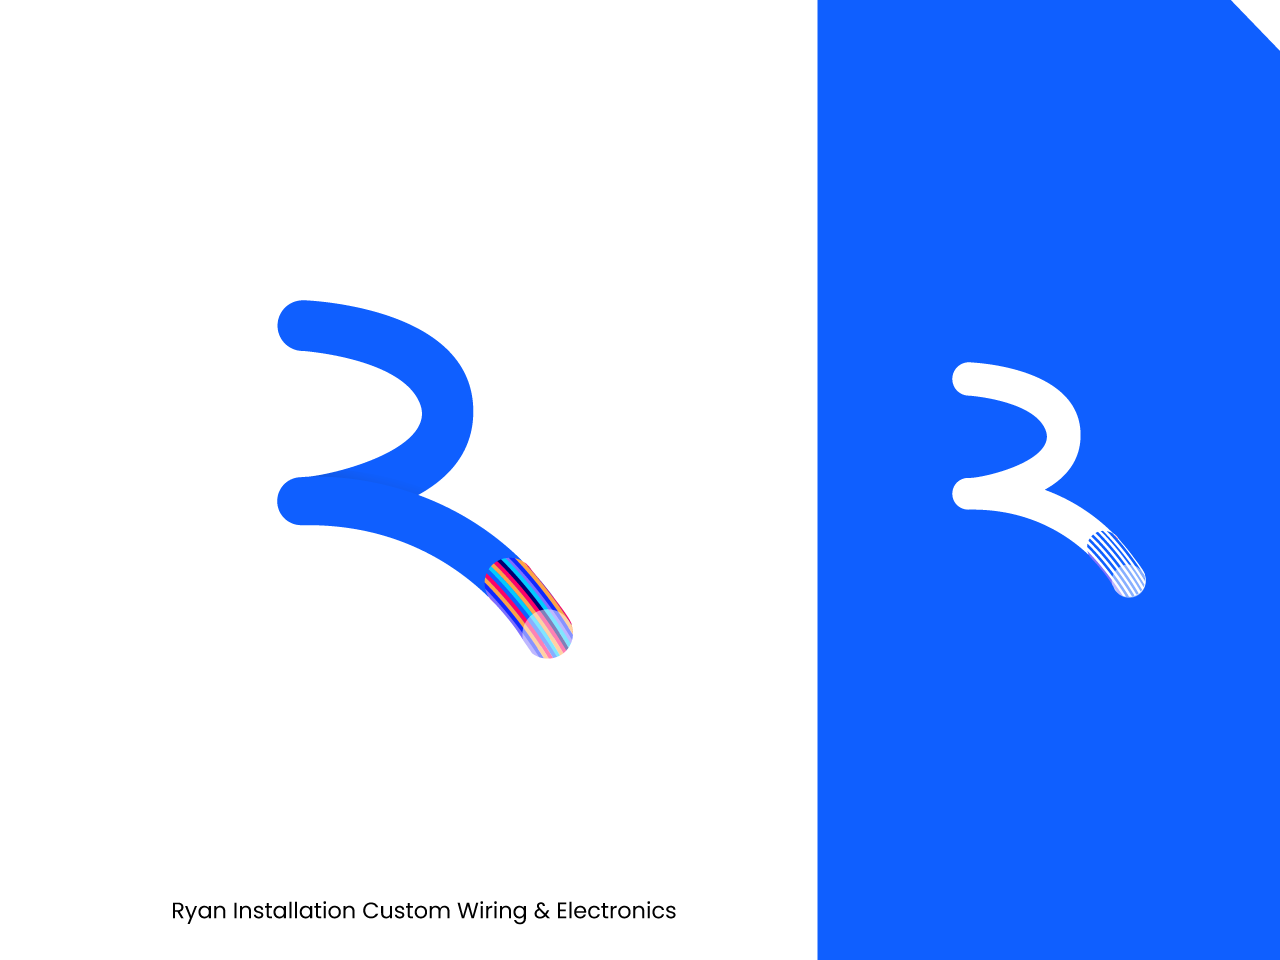 Ryan Installation r letter installation branding brand mark icon symbol mark minimal logo design clean